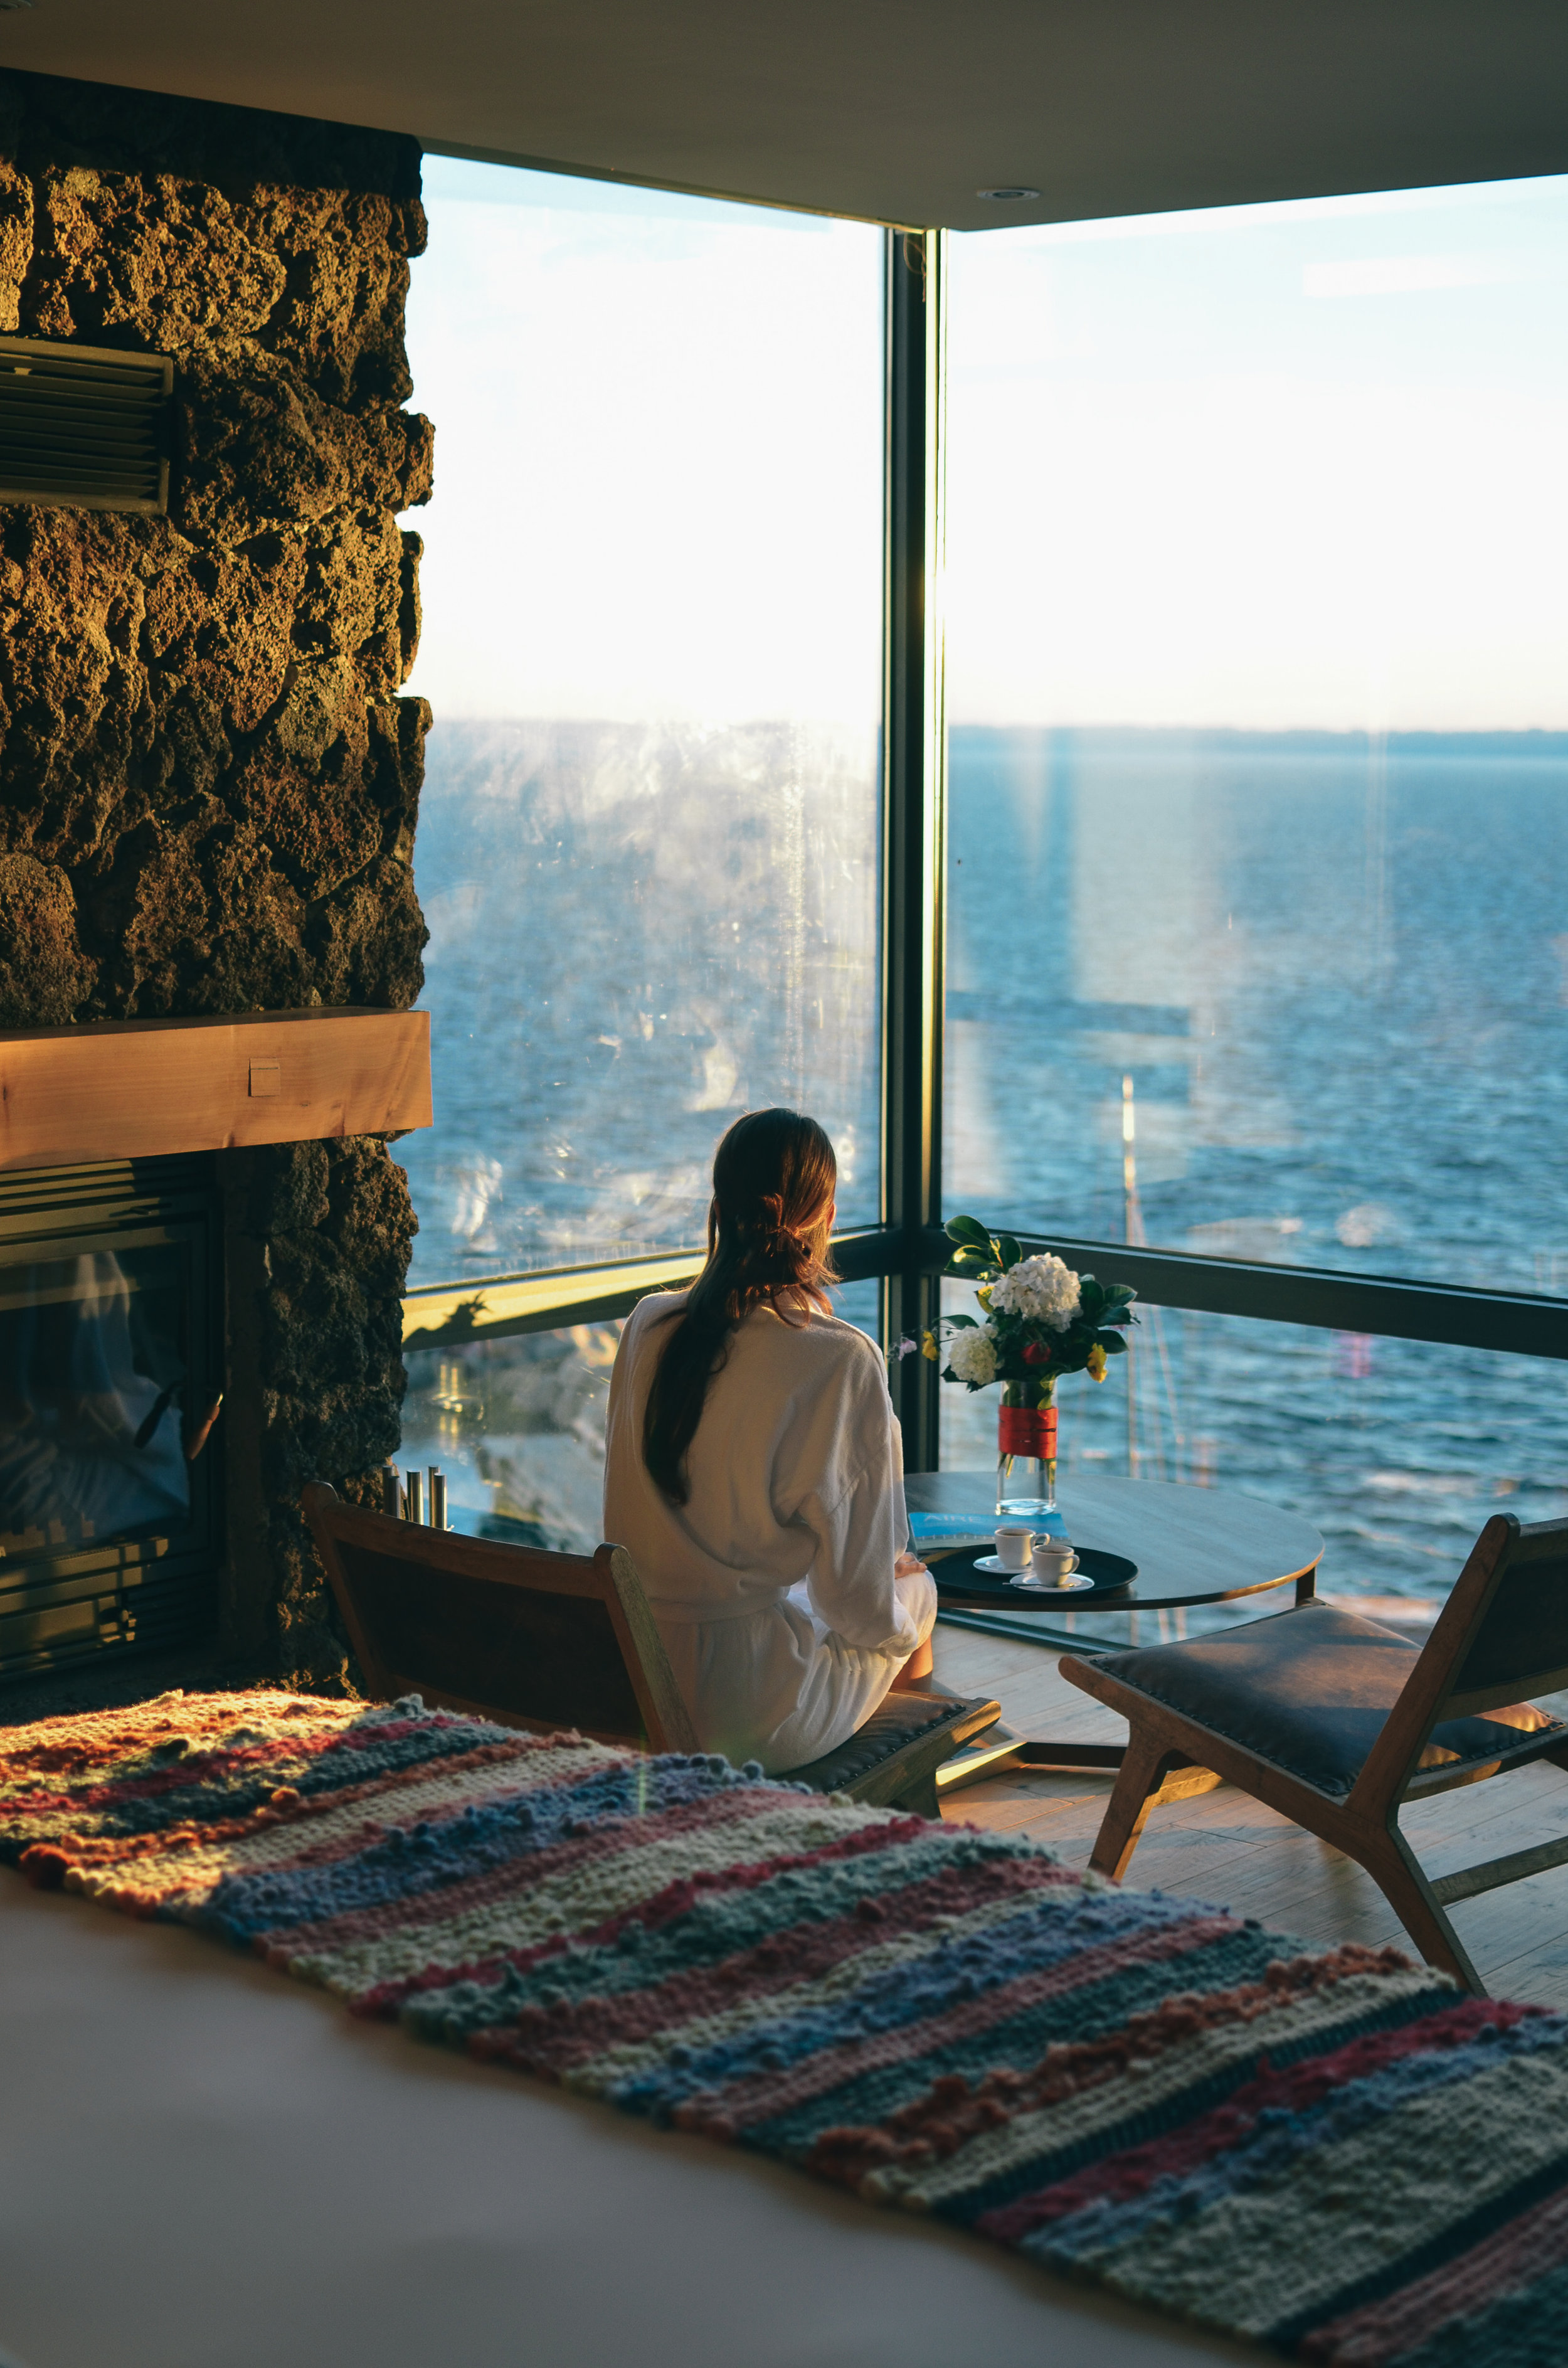 chile+awa+hotel+travel+guide+life+on+pine_DSC_1487.jpg